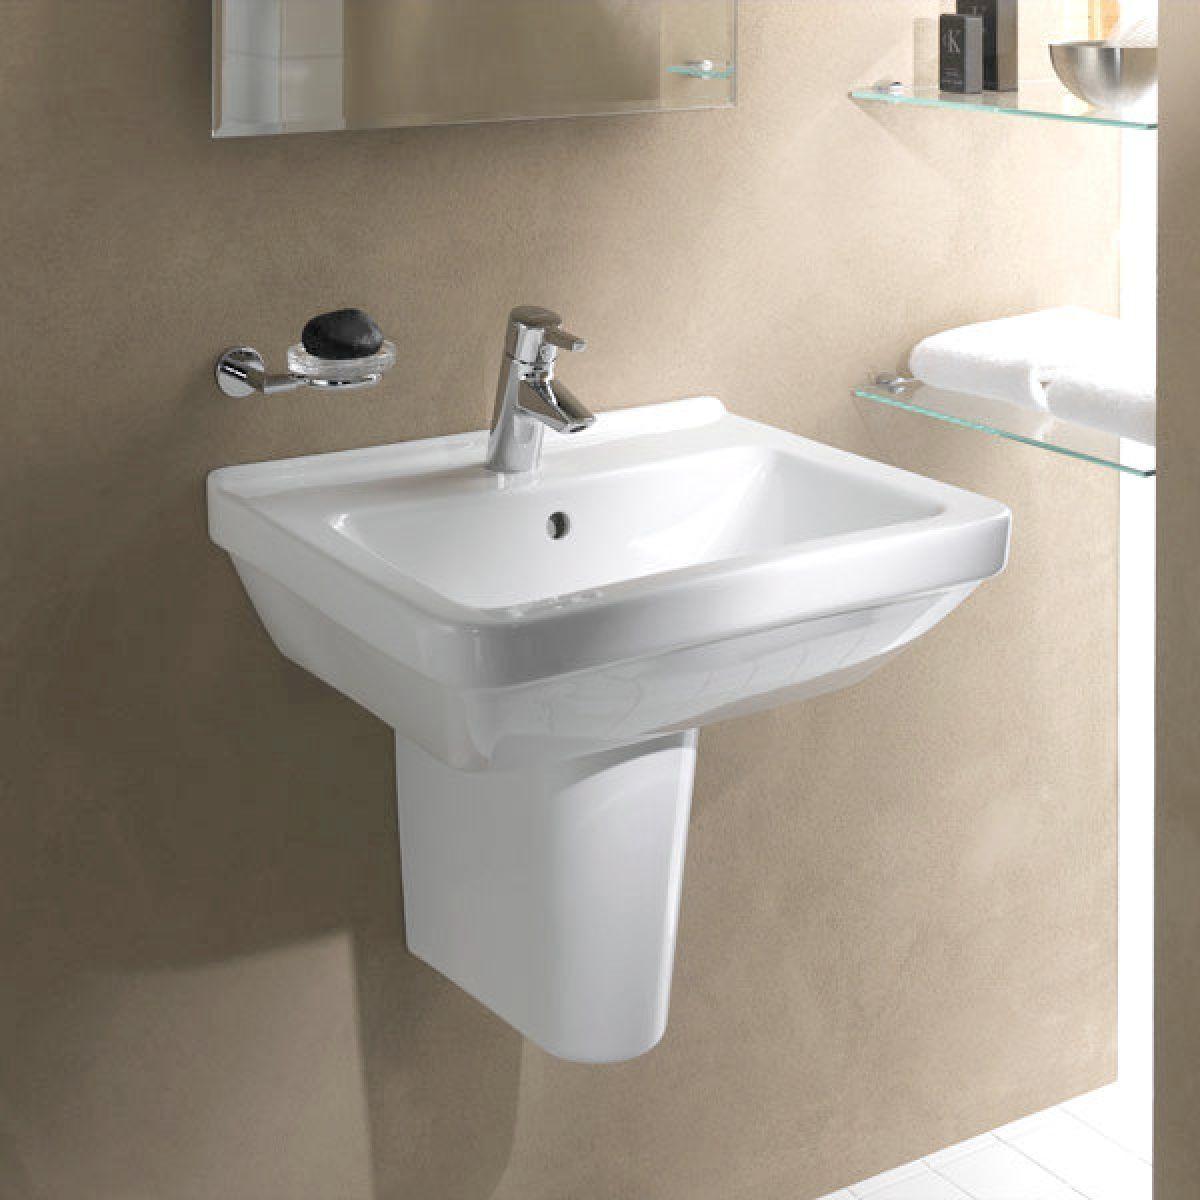 Vitra S50 Large Square Bathroom Basin Squarebathroombasin Large Bathroom Sink Modern Bathroom Sink Vitra Bathrooms